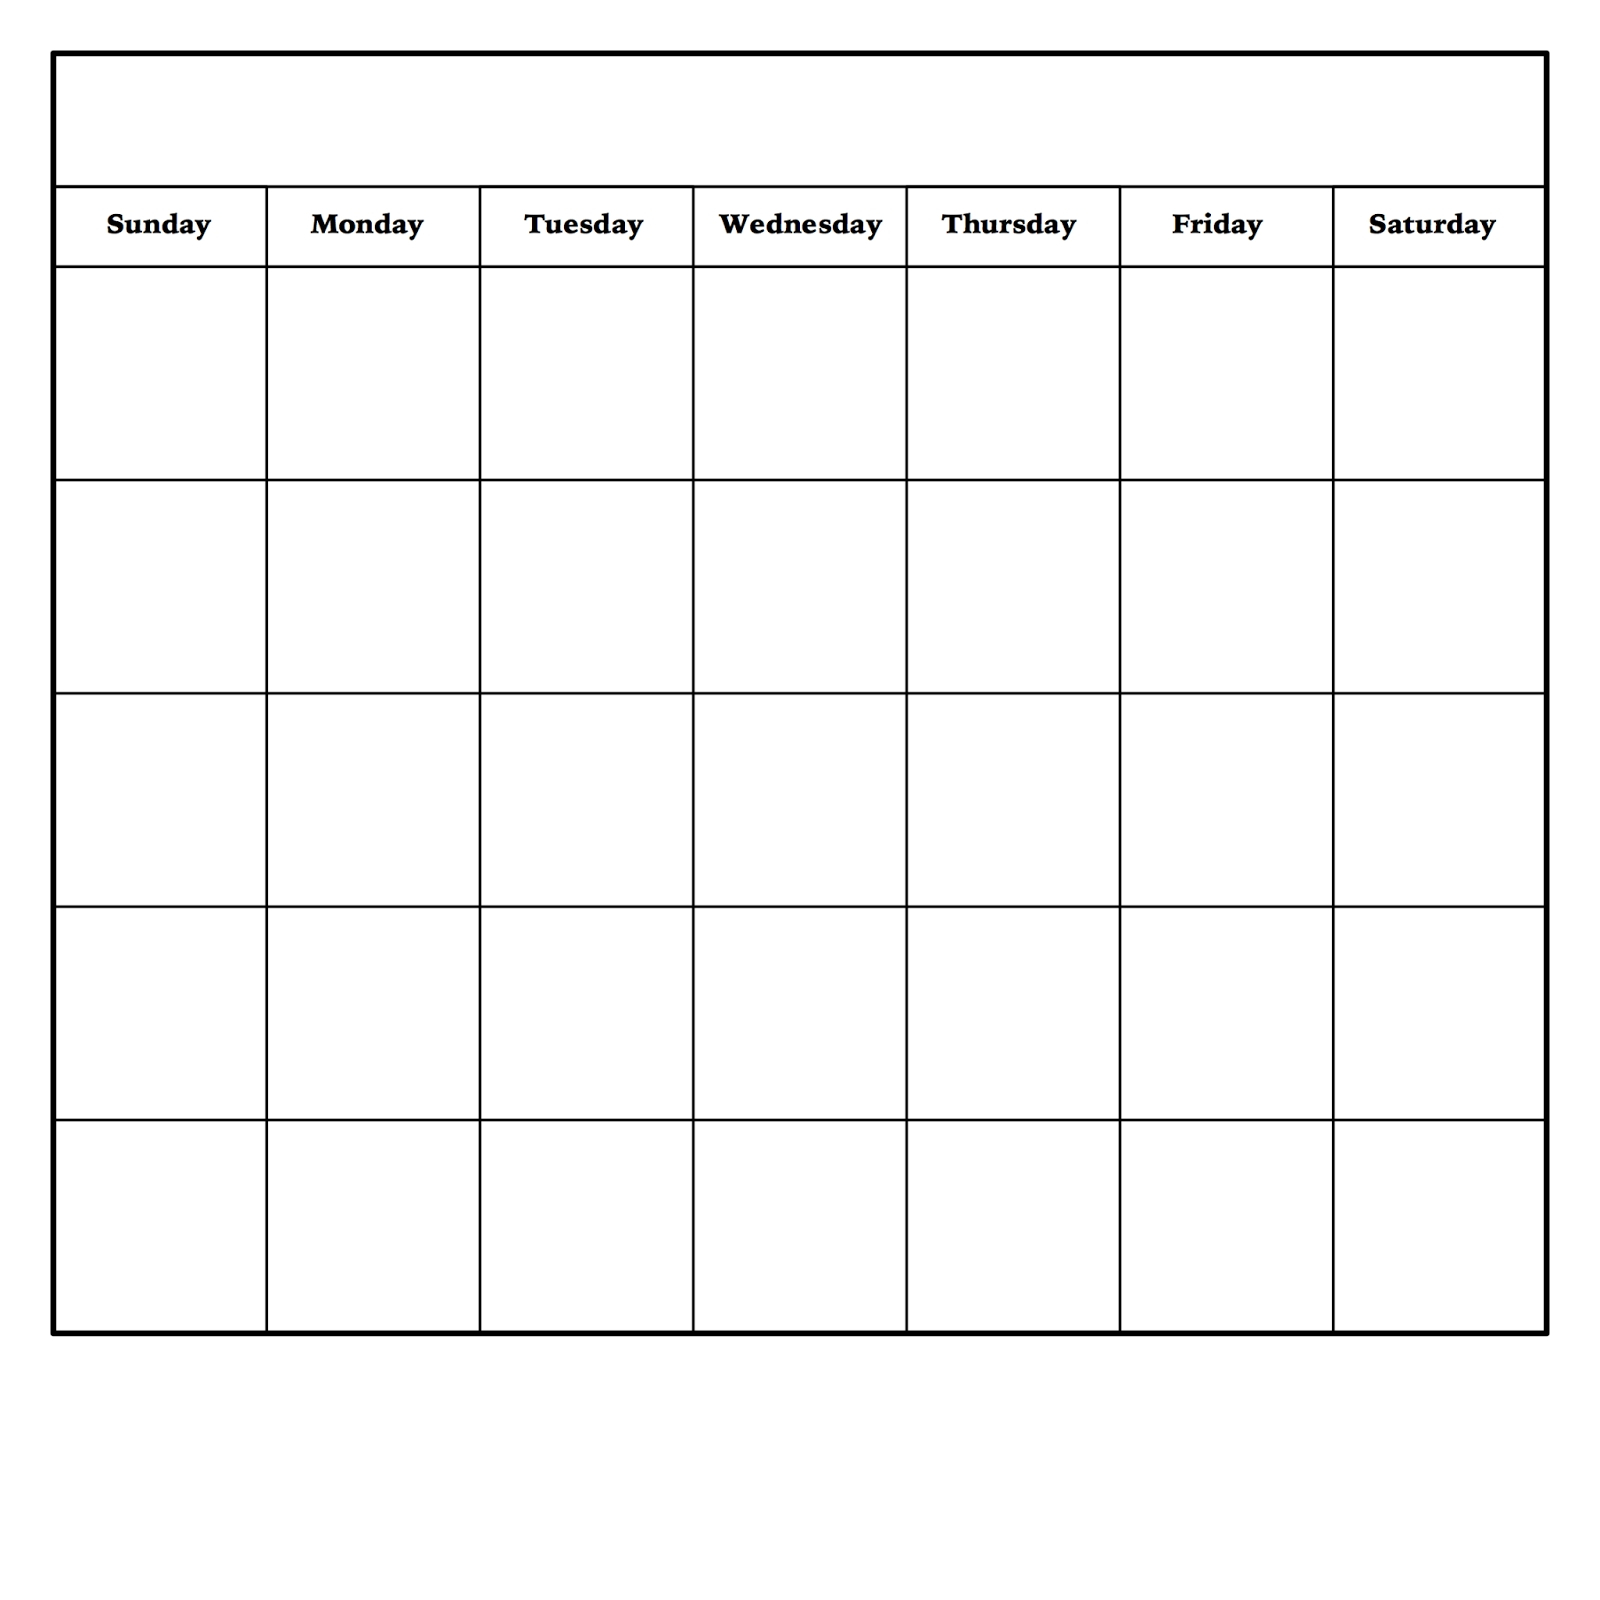 Printable Monthly Calendar Sunday To Saturday No Dates within Sunday Saturday Calendar